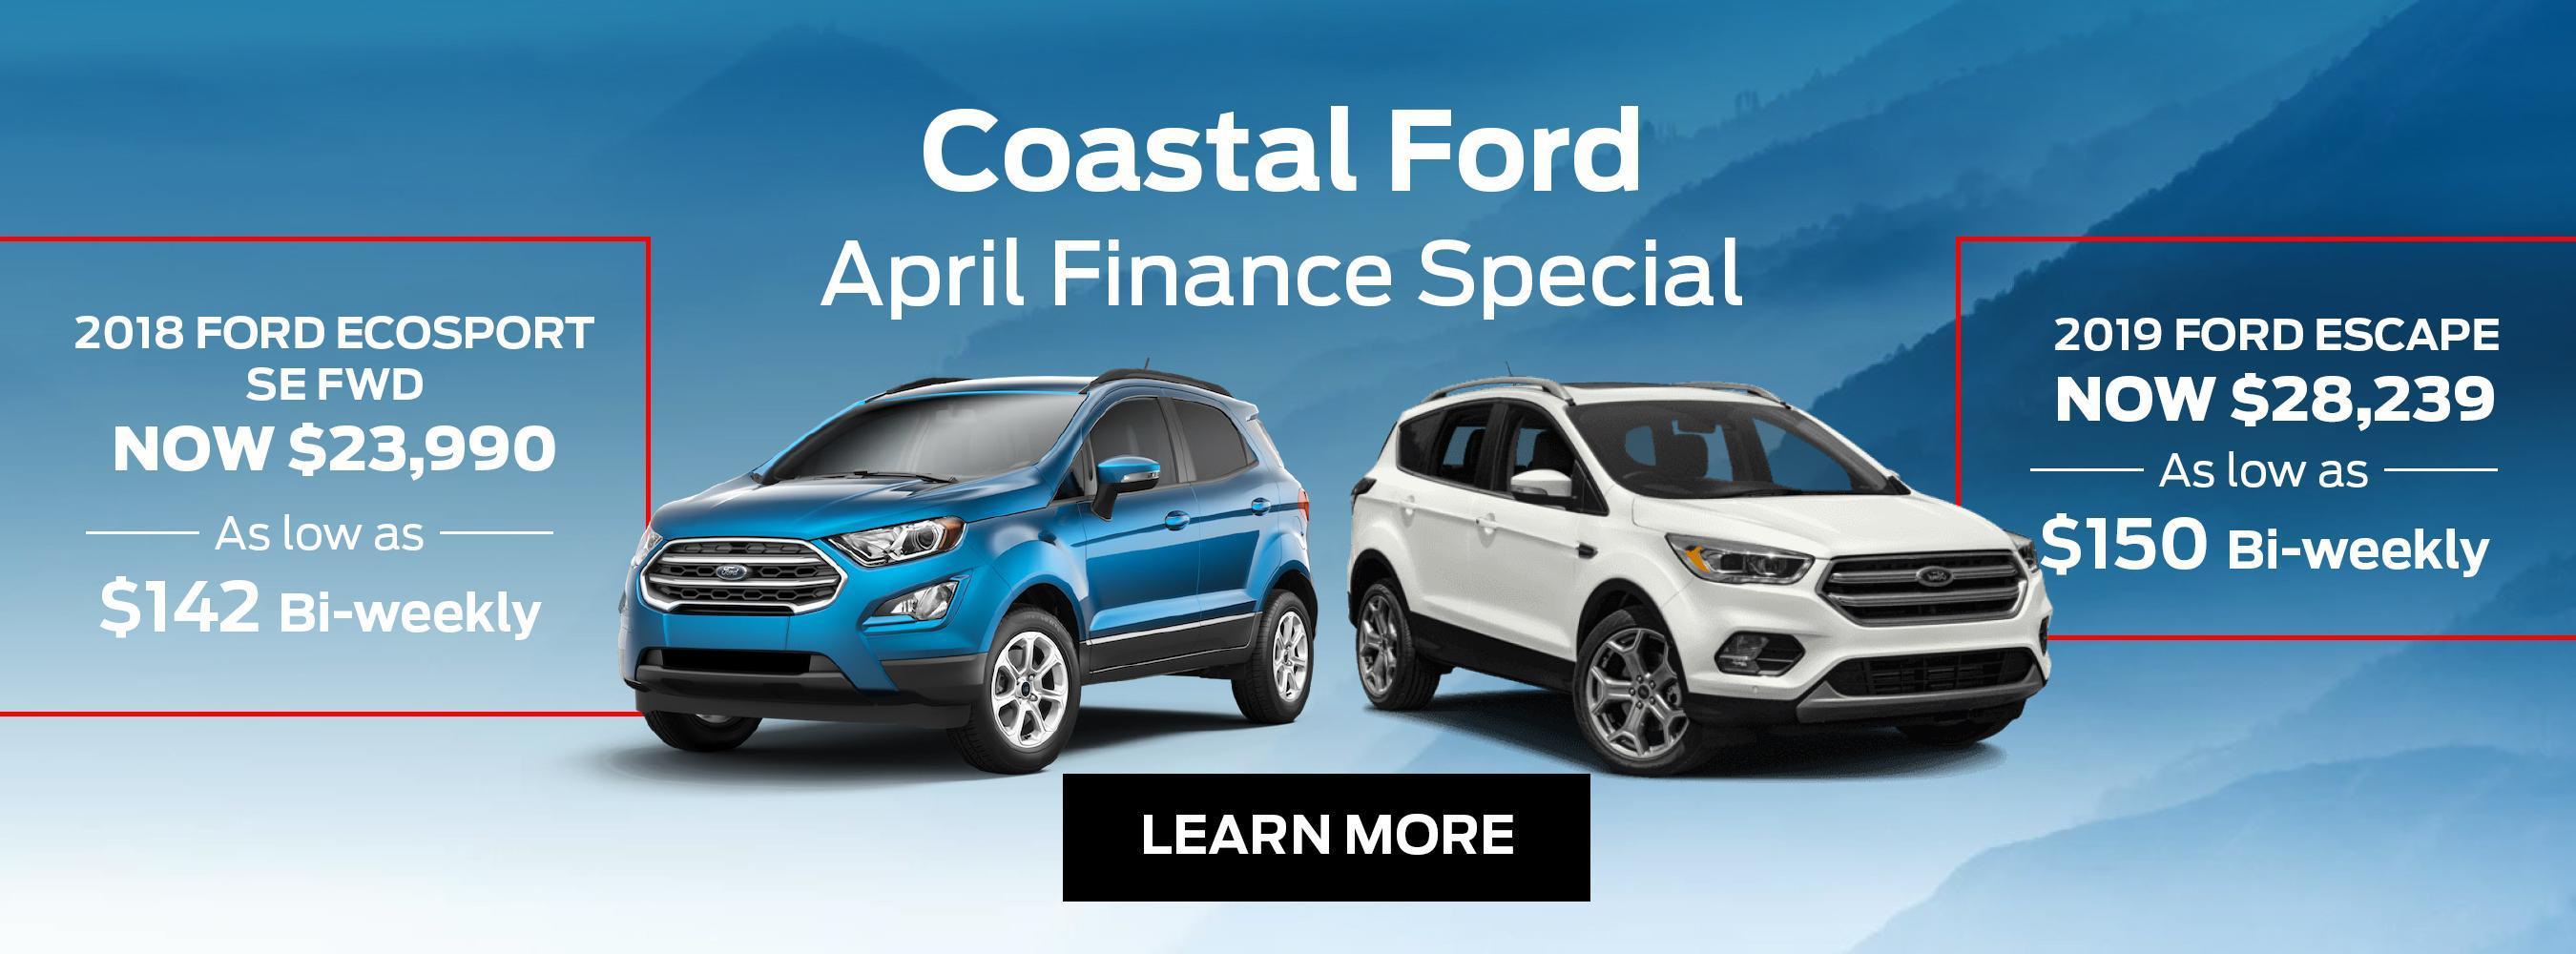 April Finance